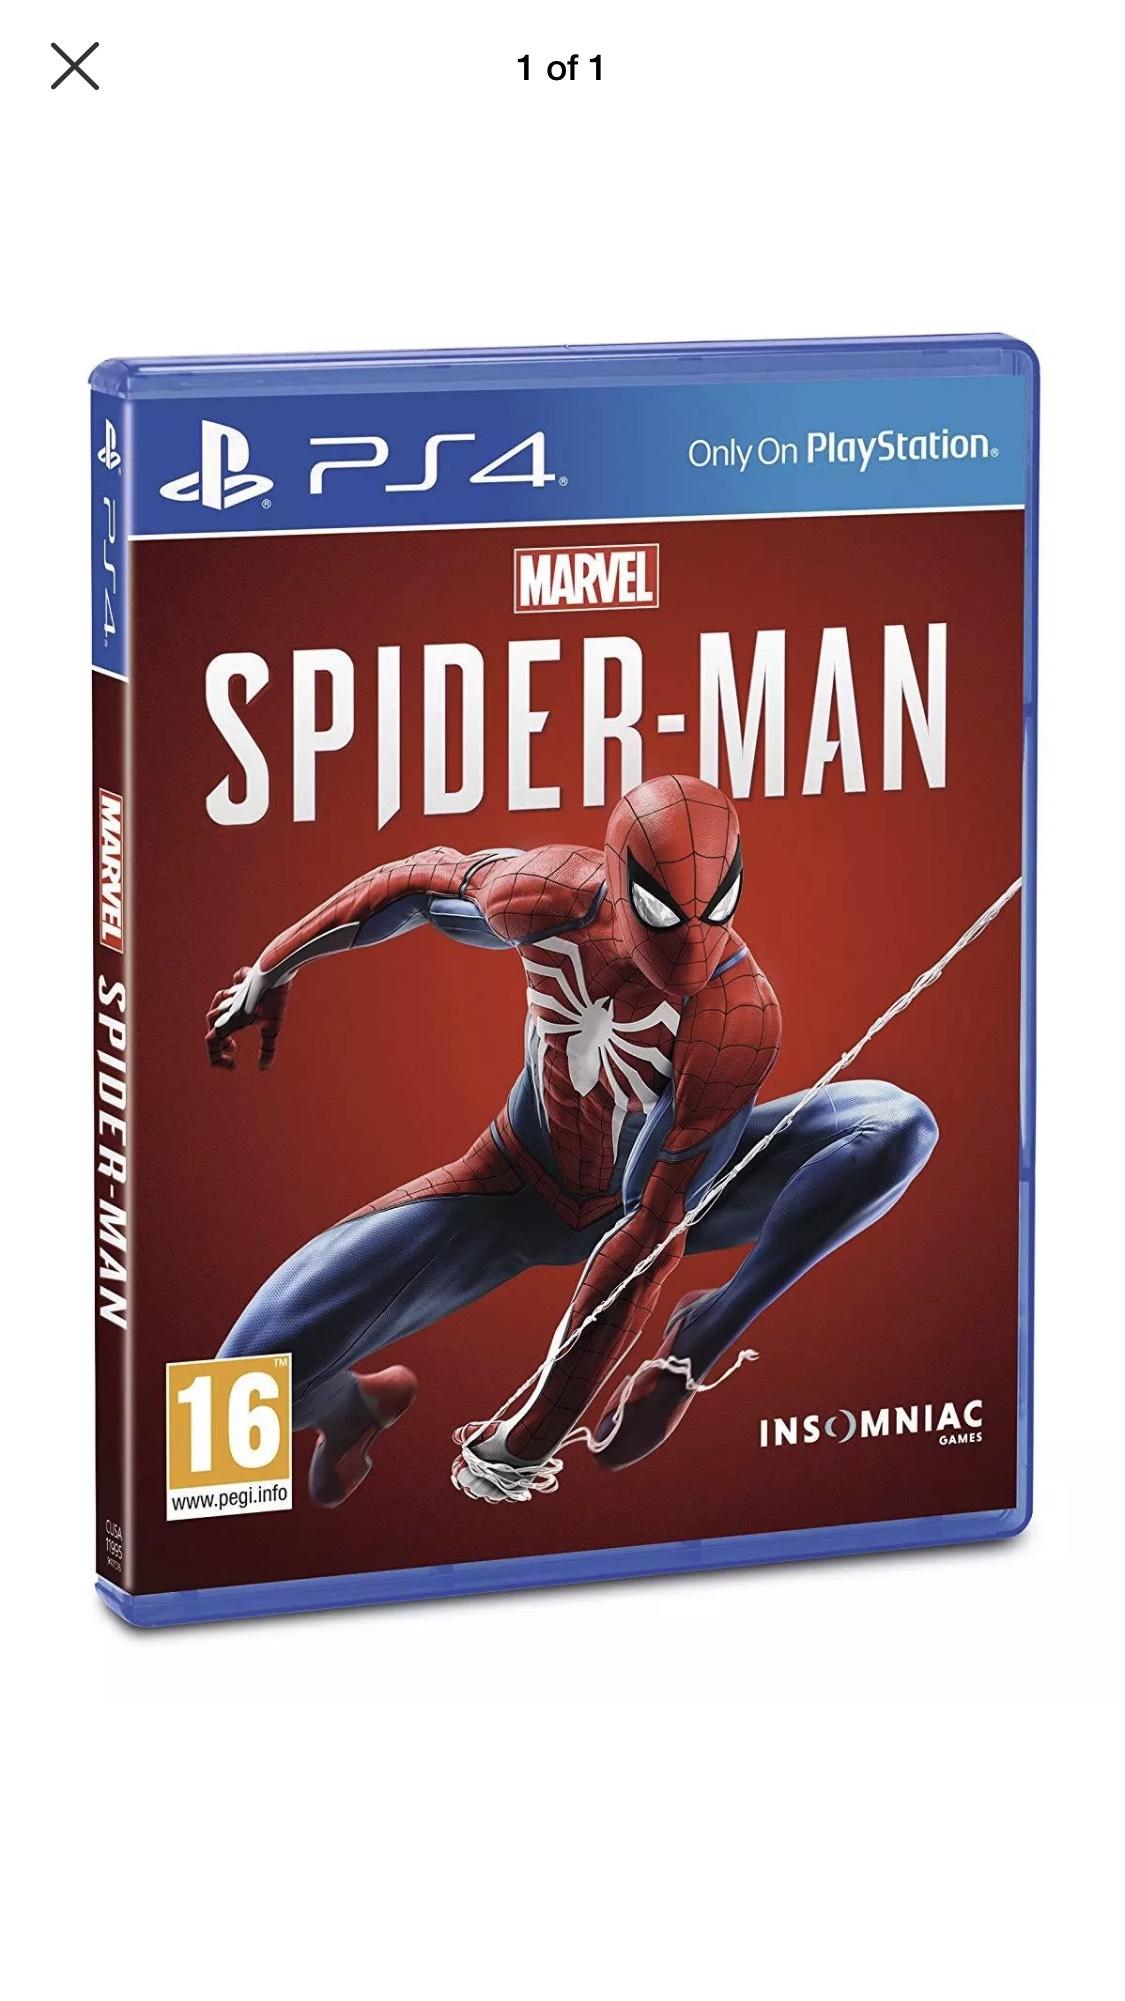 Spiderman PS4, Used - good - £12.99 @ boomerangrentals / eBay